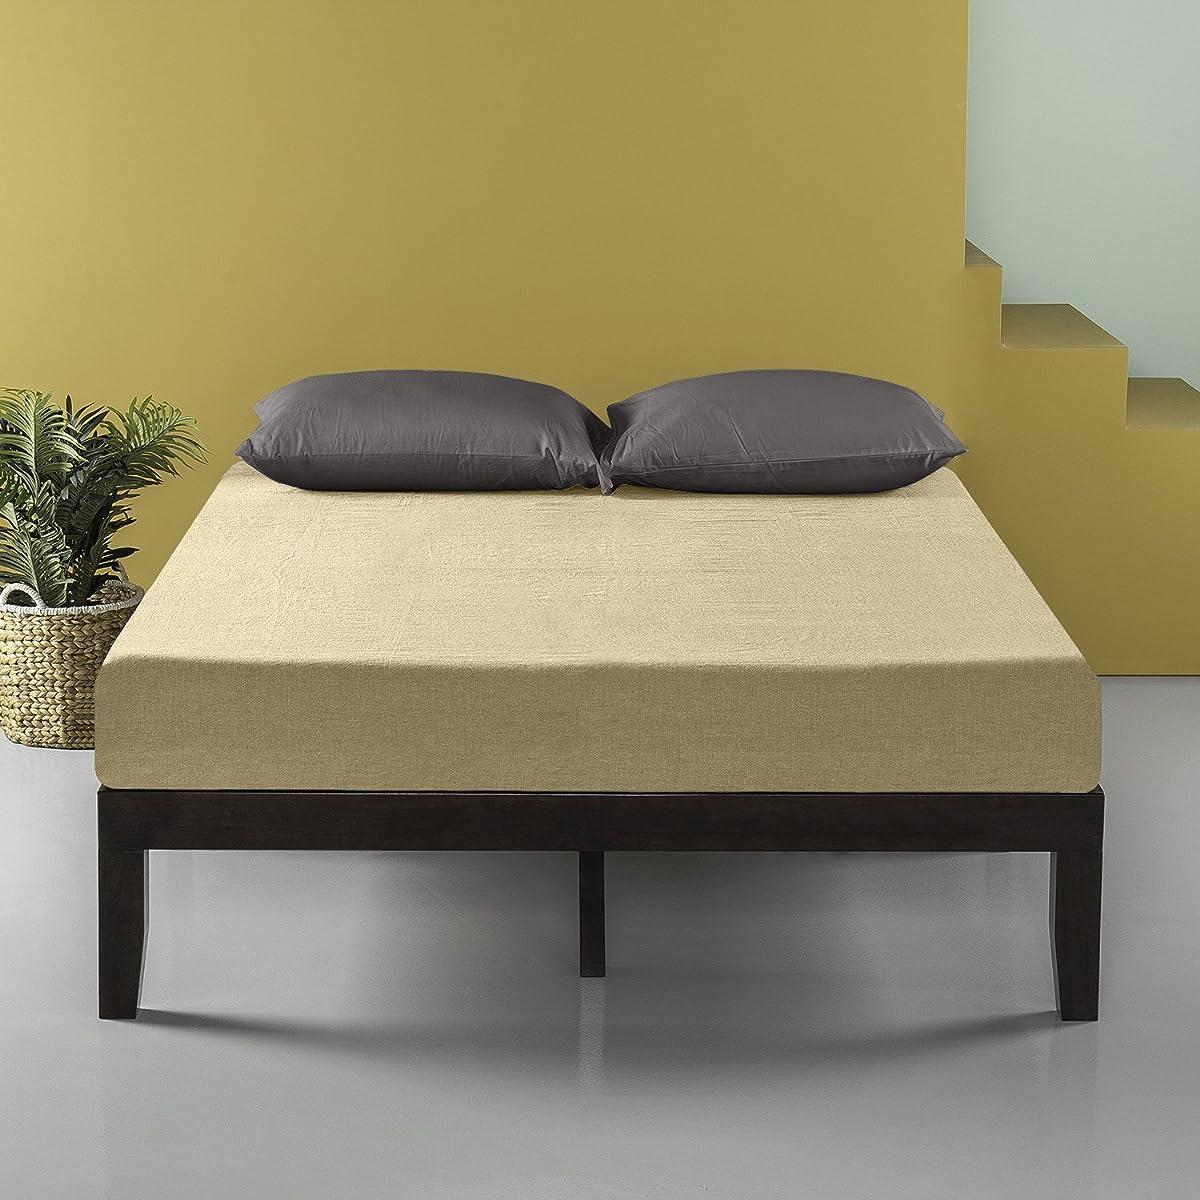 Zinus 14 Inch Wood Platform Bed / No Box Spring Needed / Wood Slat Support / Dark Brown, Full